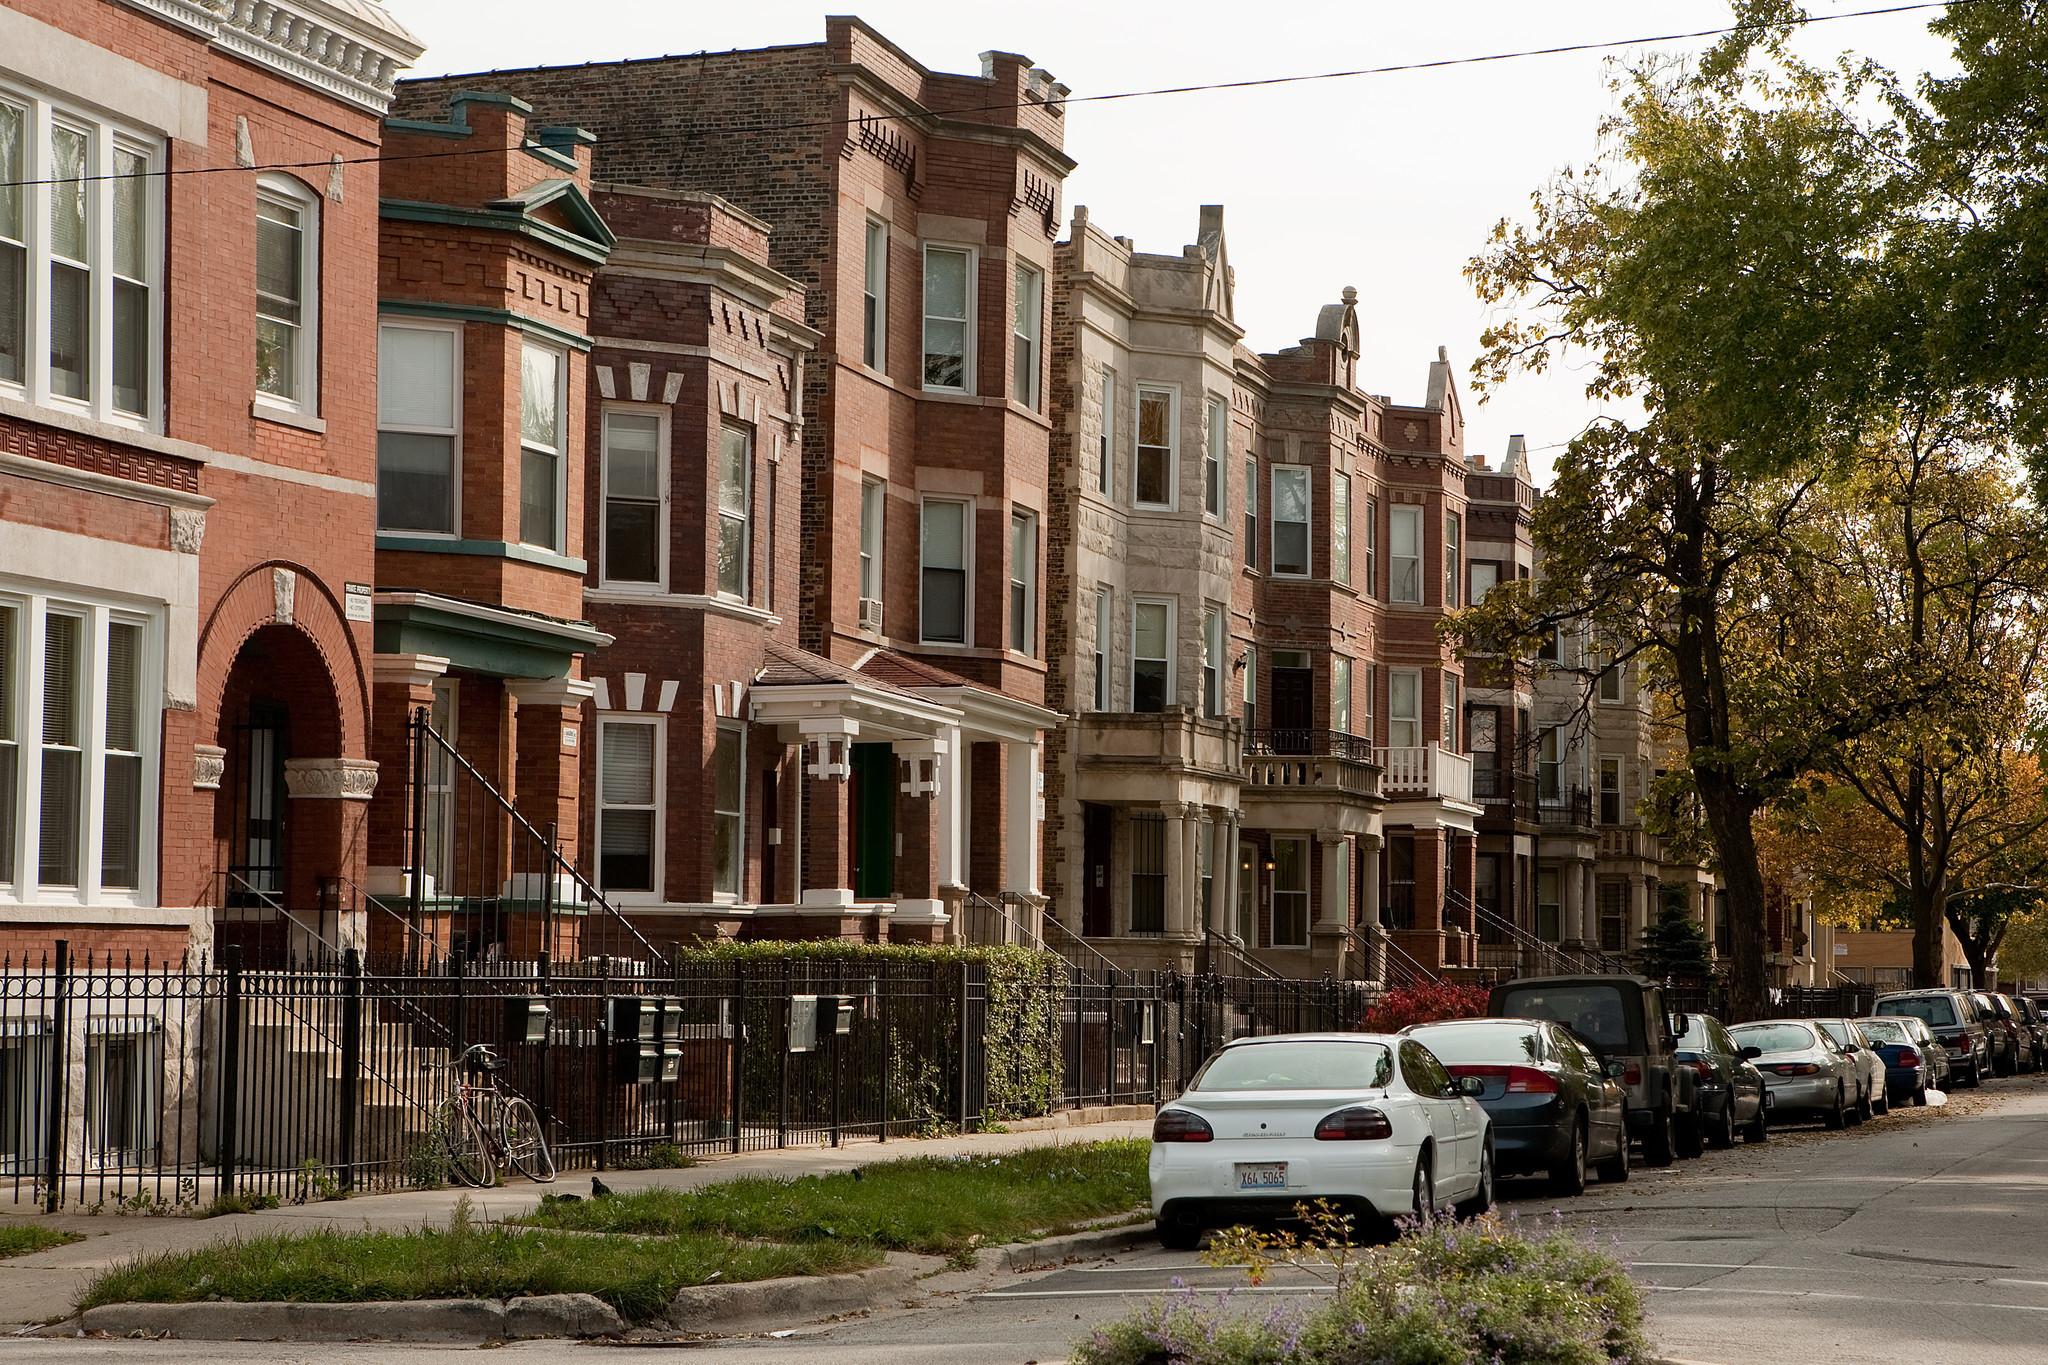 Hot Neighborhoods Humboldt Park West Pullman Among Areas Showing Gains Chicago Tribune